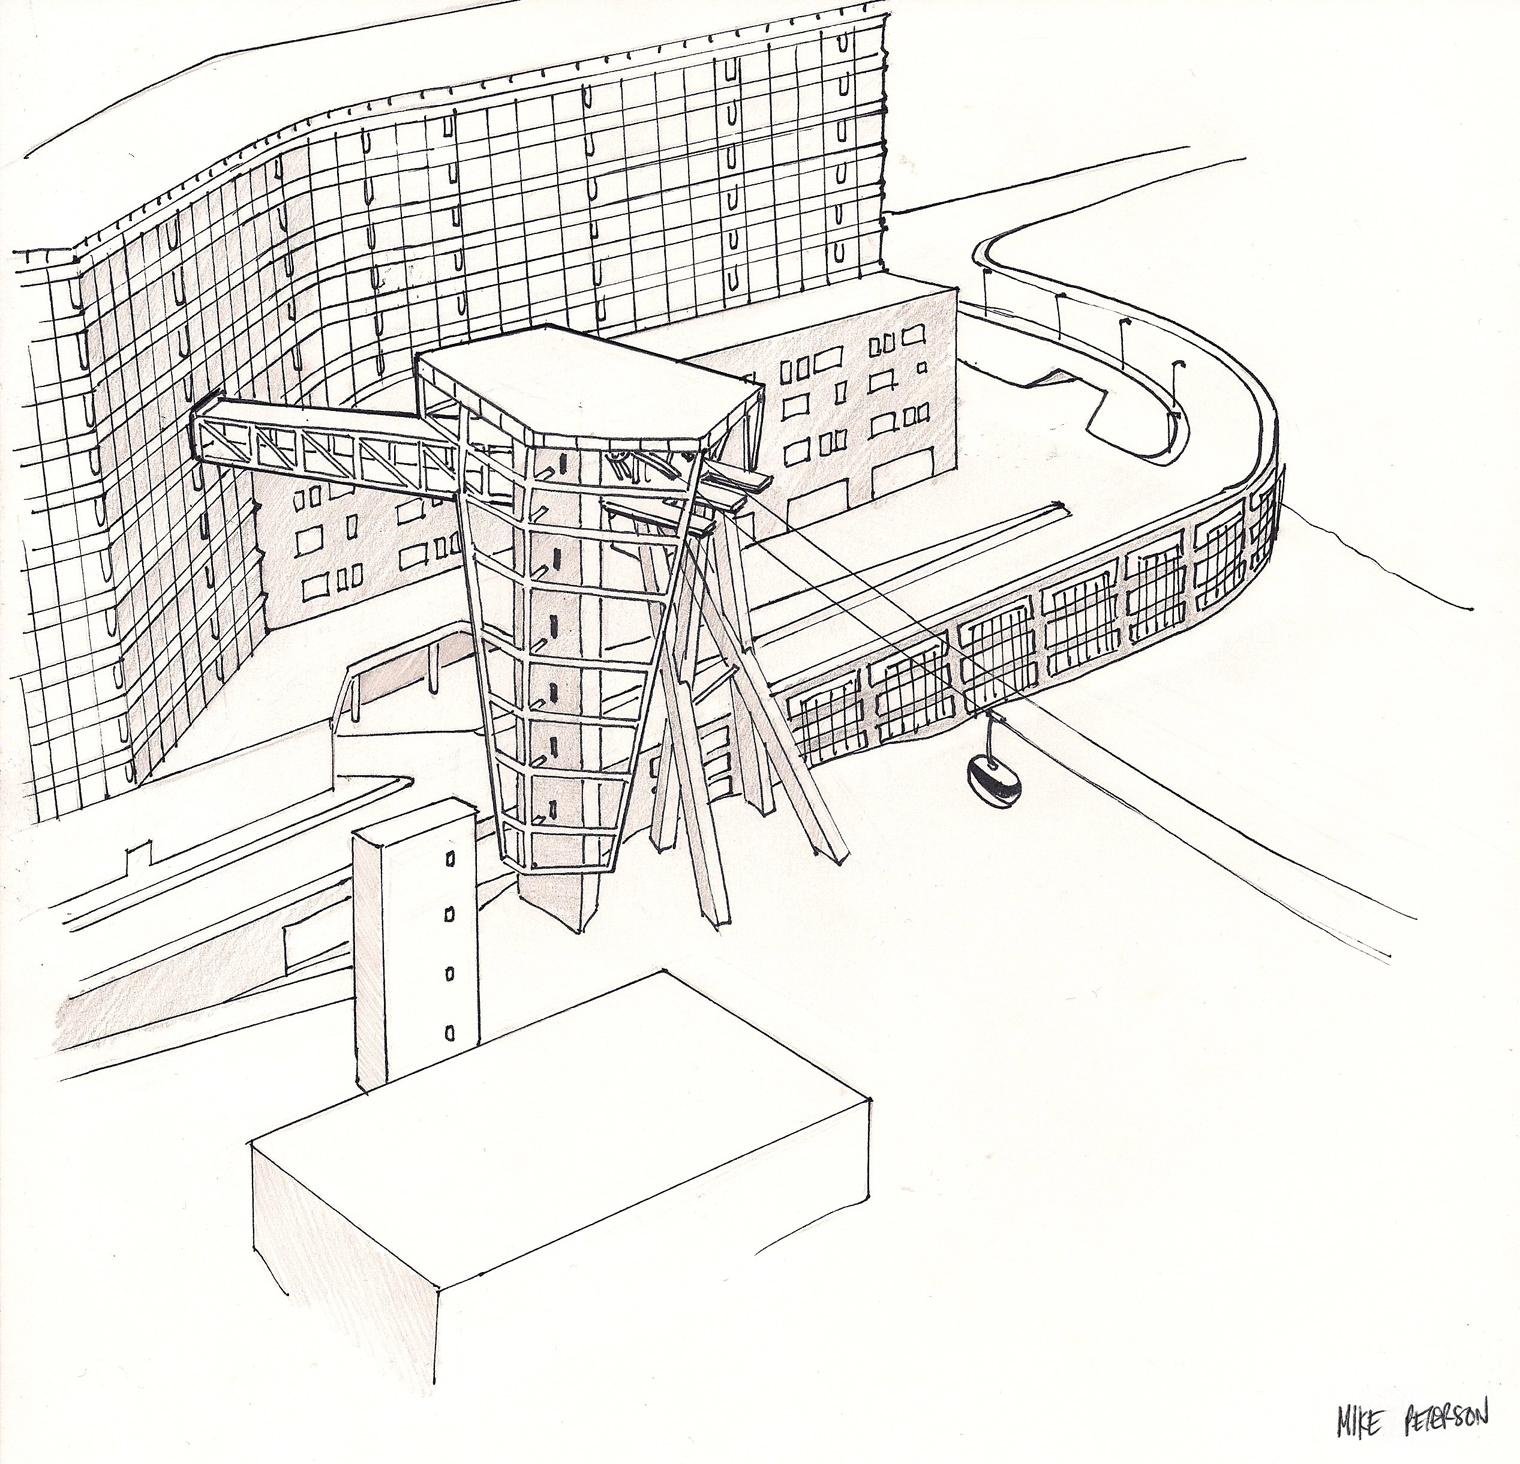 System Center Architecture Diagram